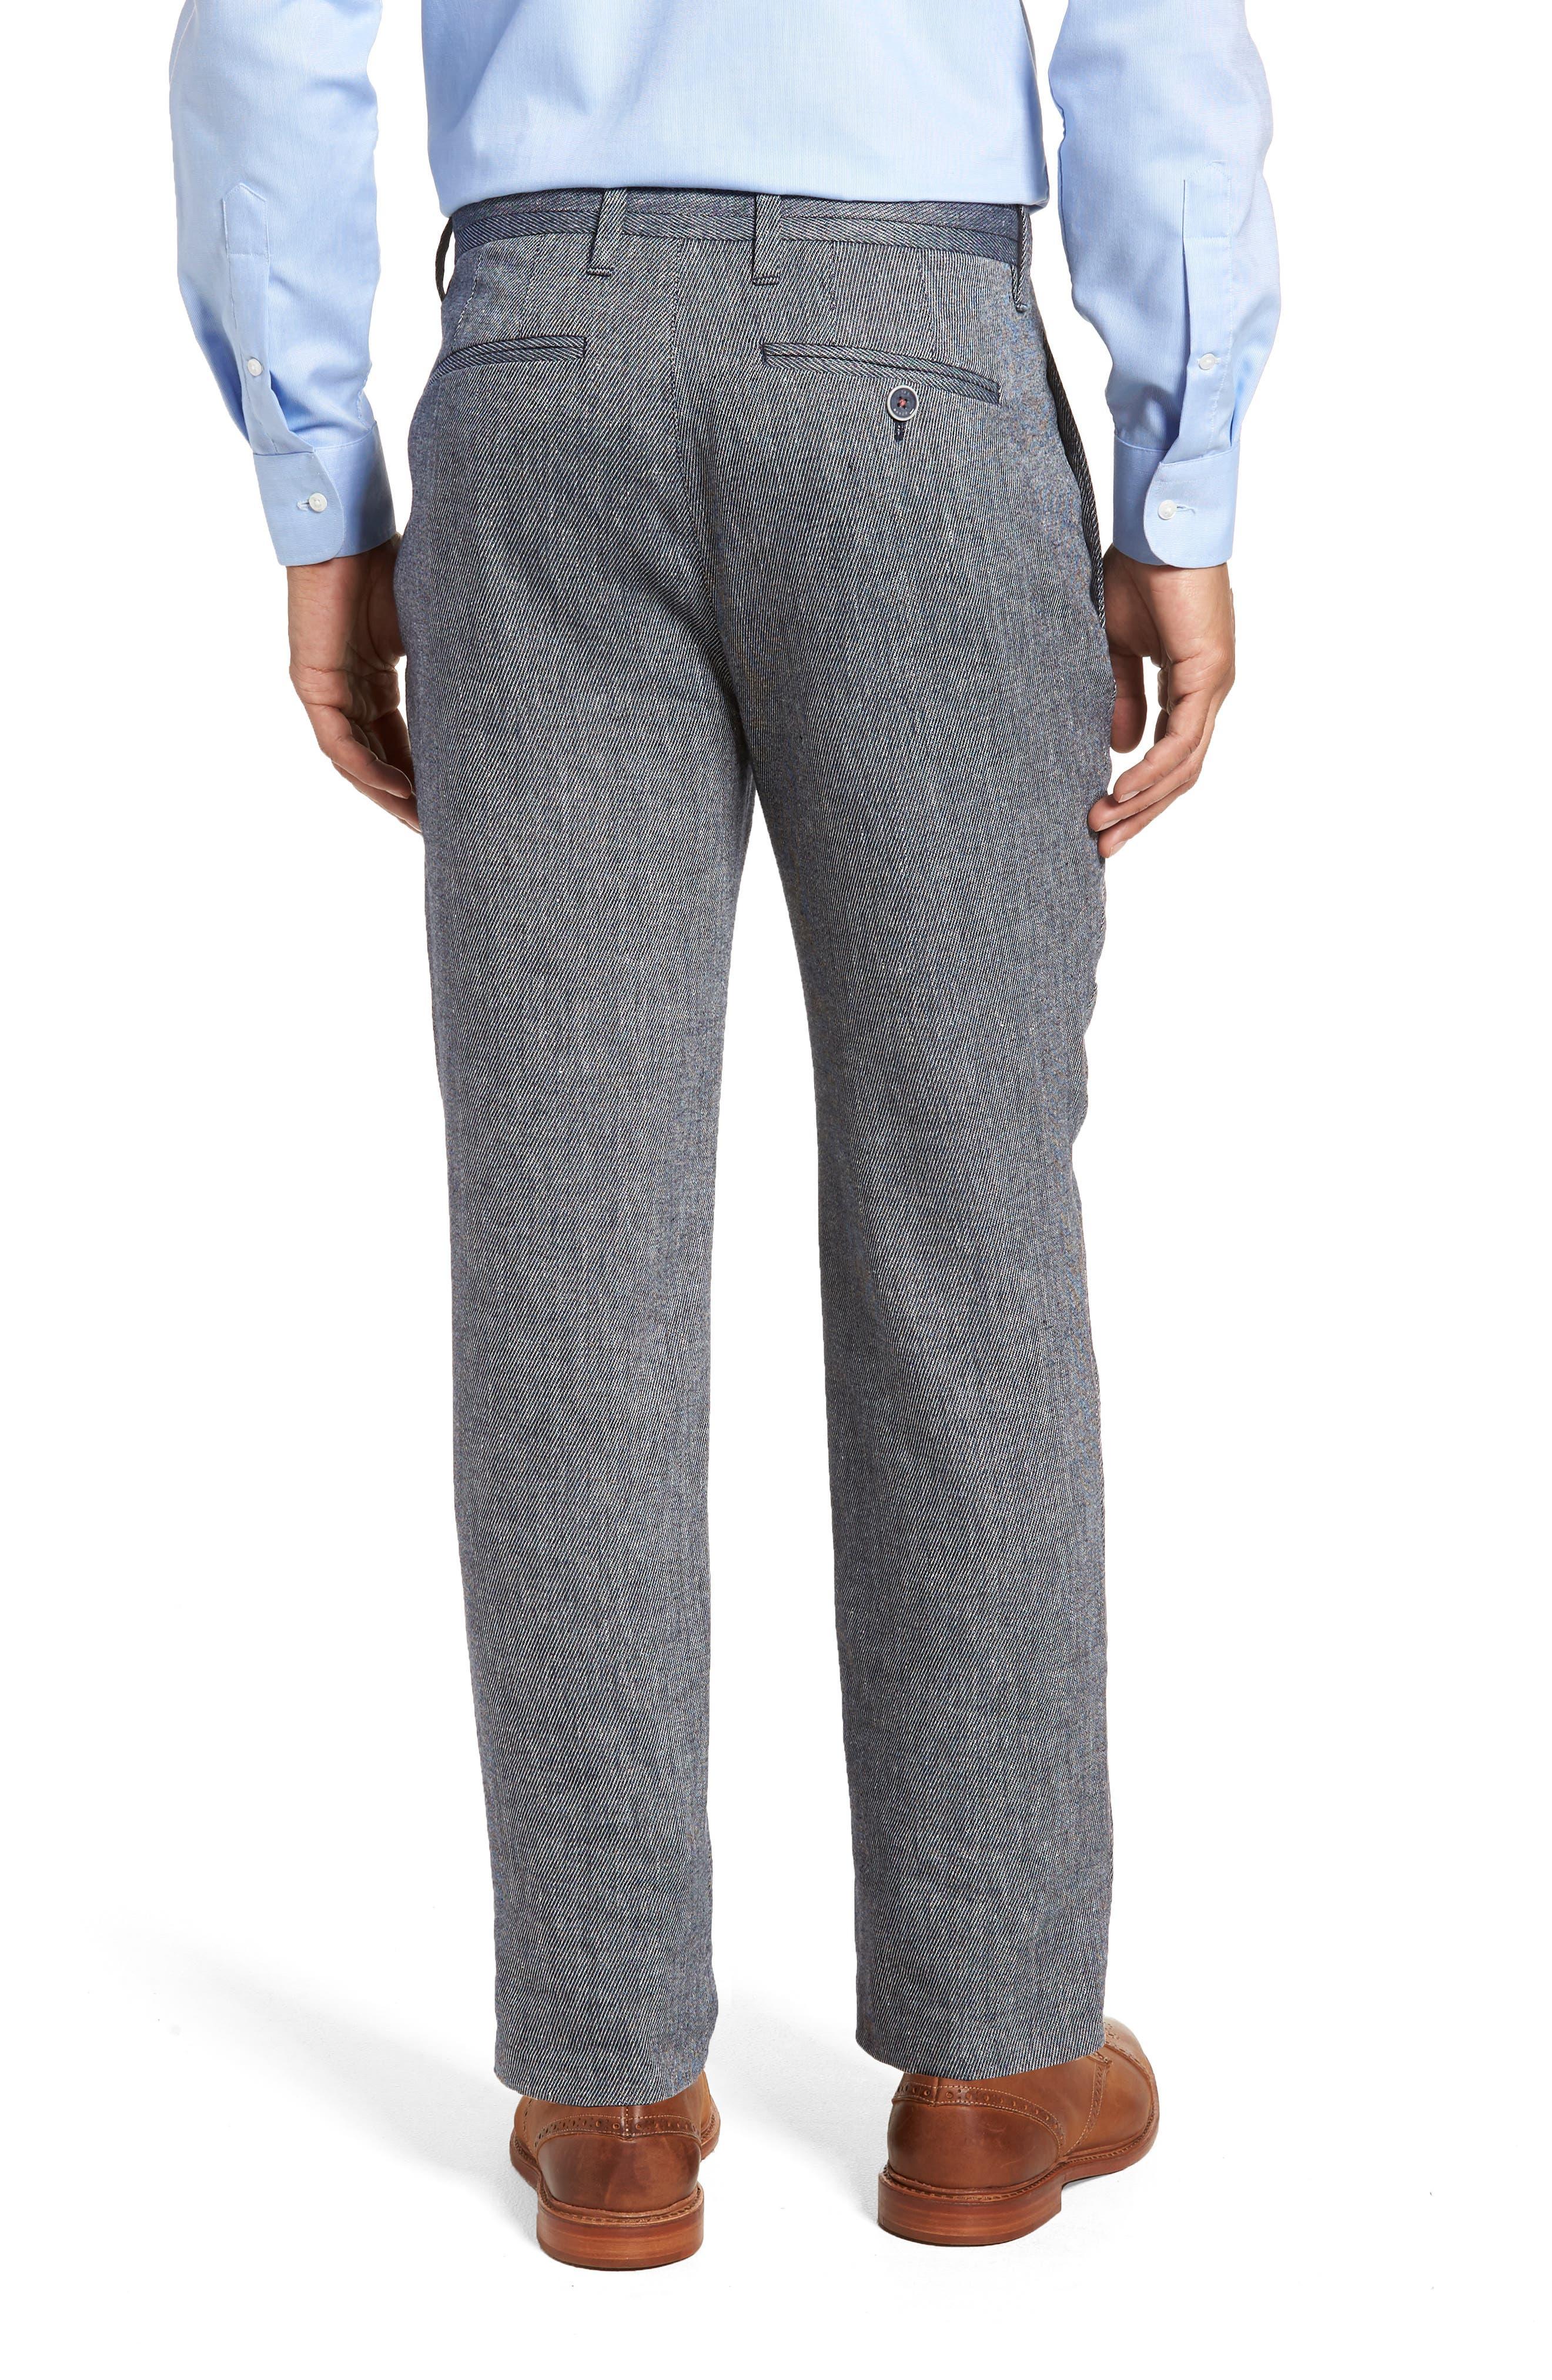 Clifrot Trim Fit Trousers,                             Alternate thumbnail 2, color,                             Blue